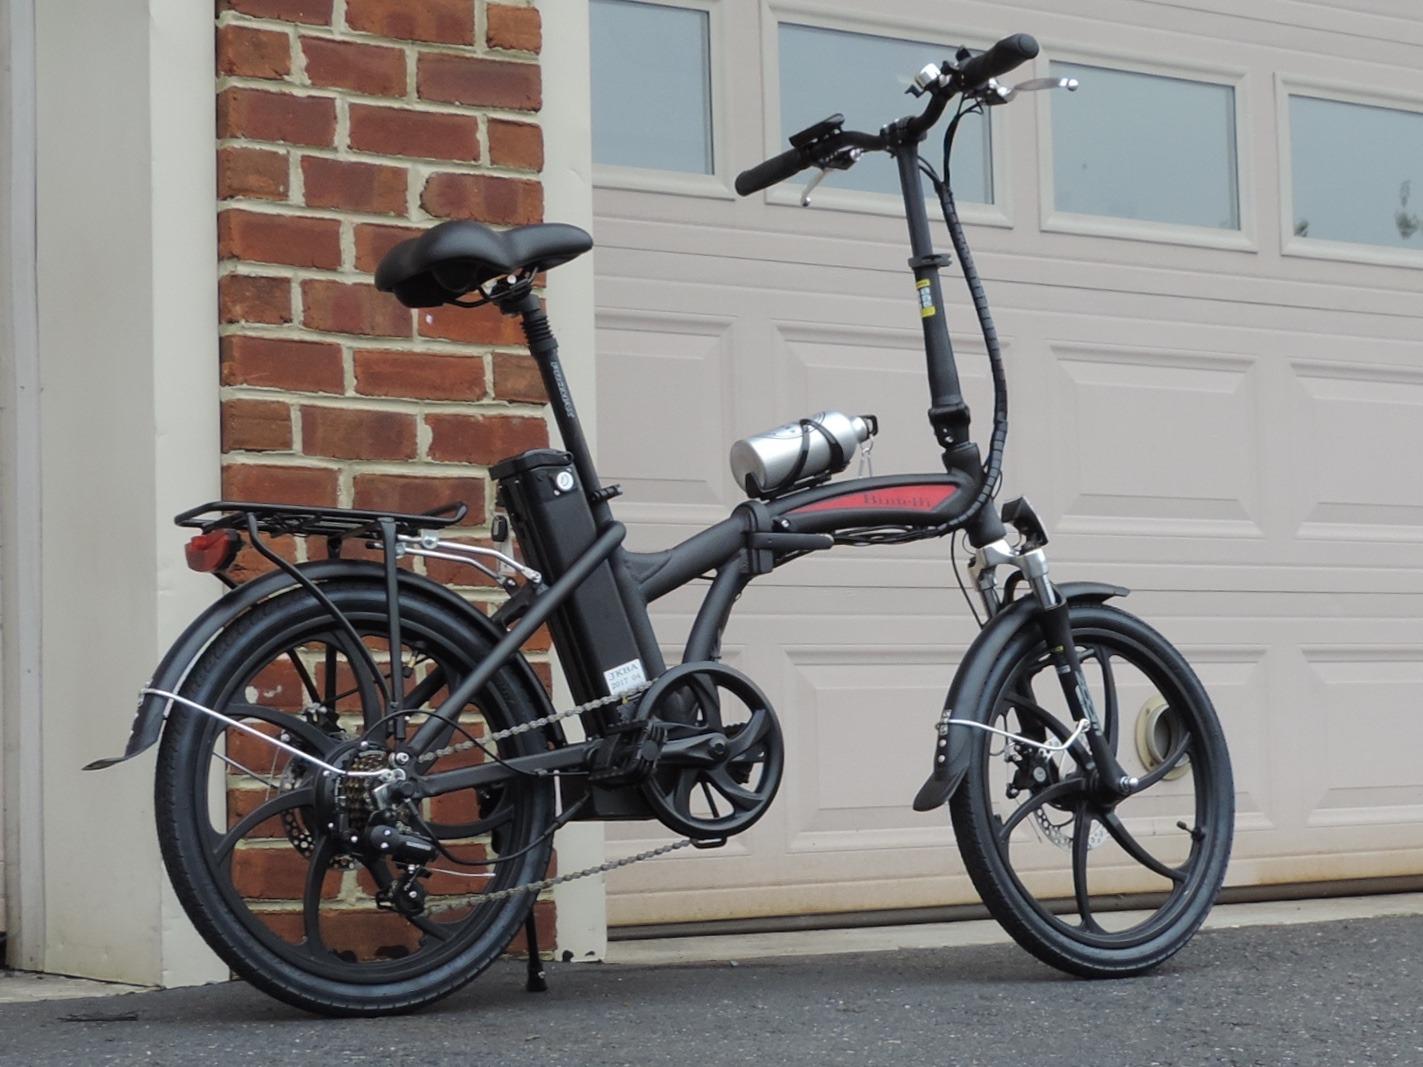 New-2019-Bintelli-F1-Electric-Folding-Bike